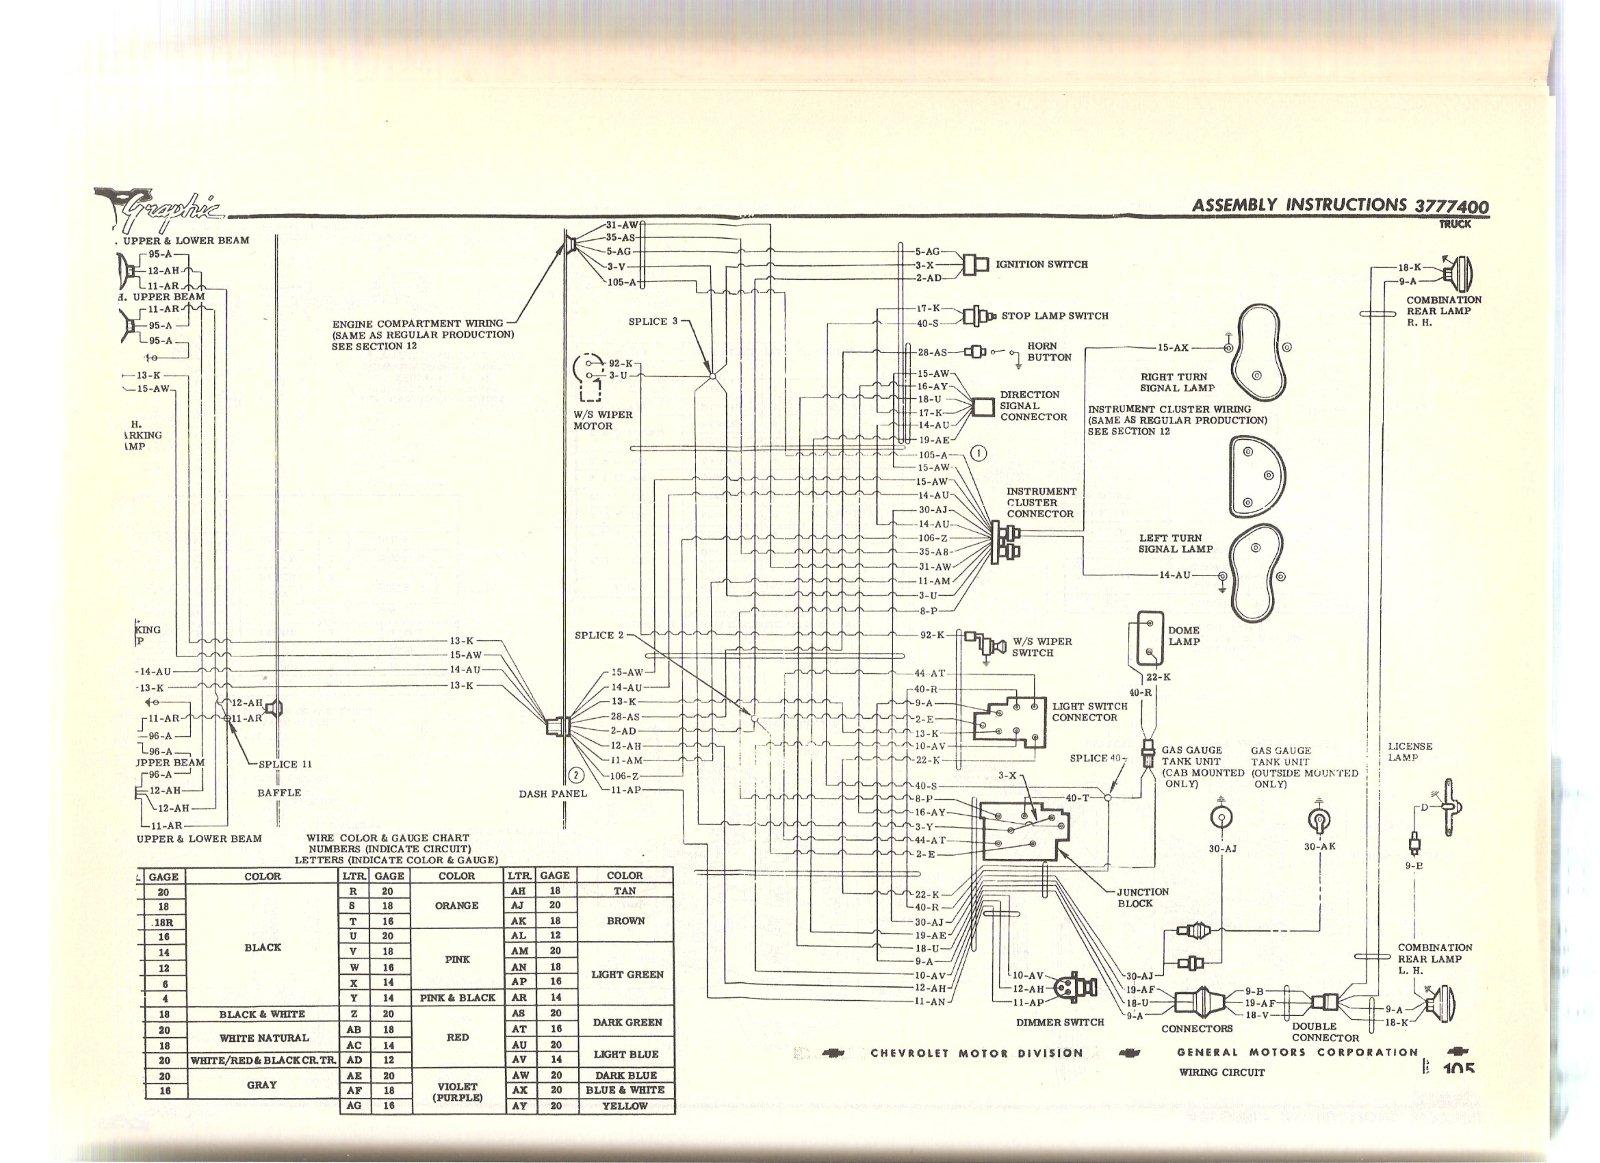 wiring diagram the present chevrolet gmc truck message here ya go